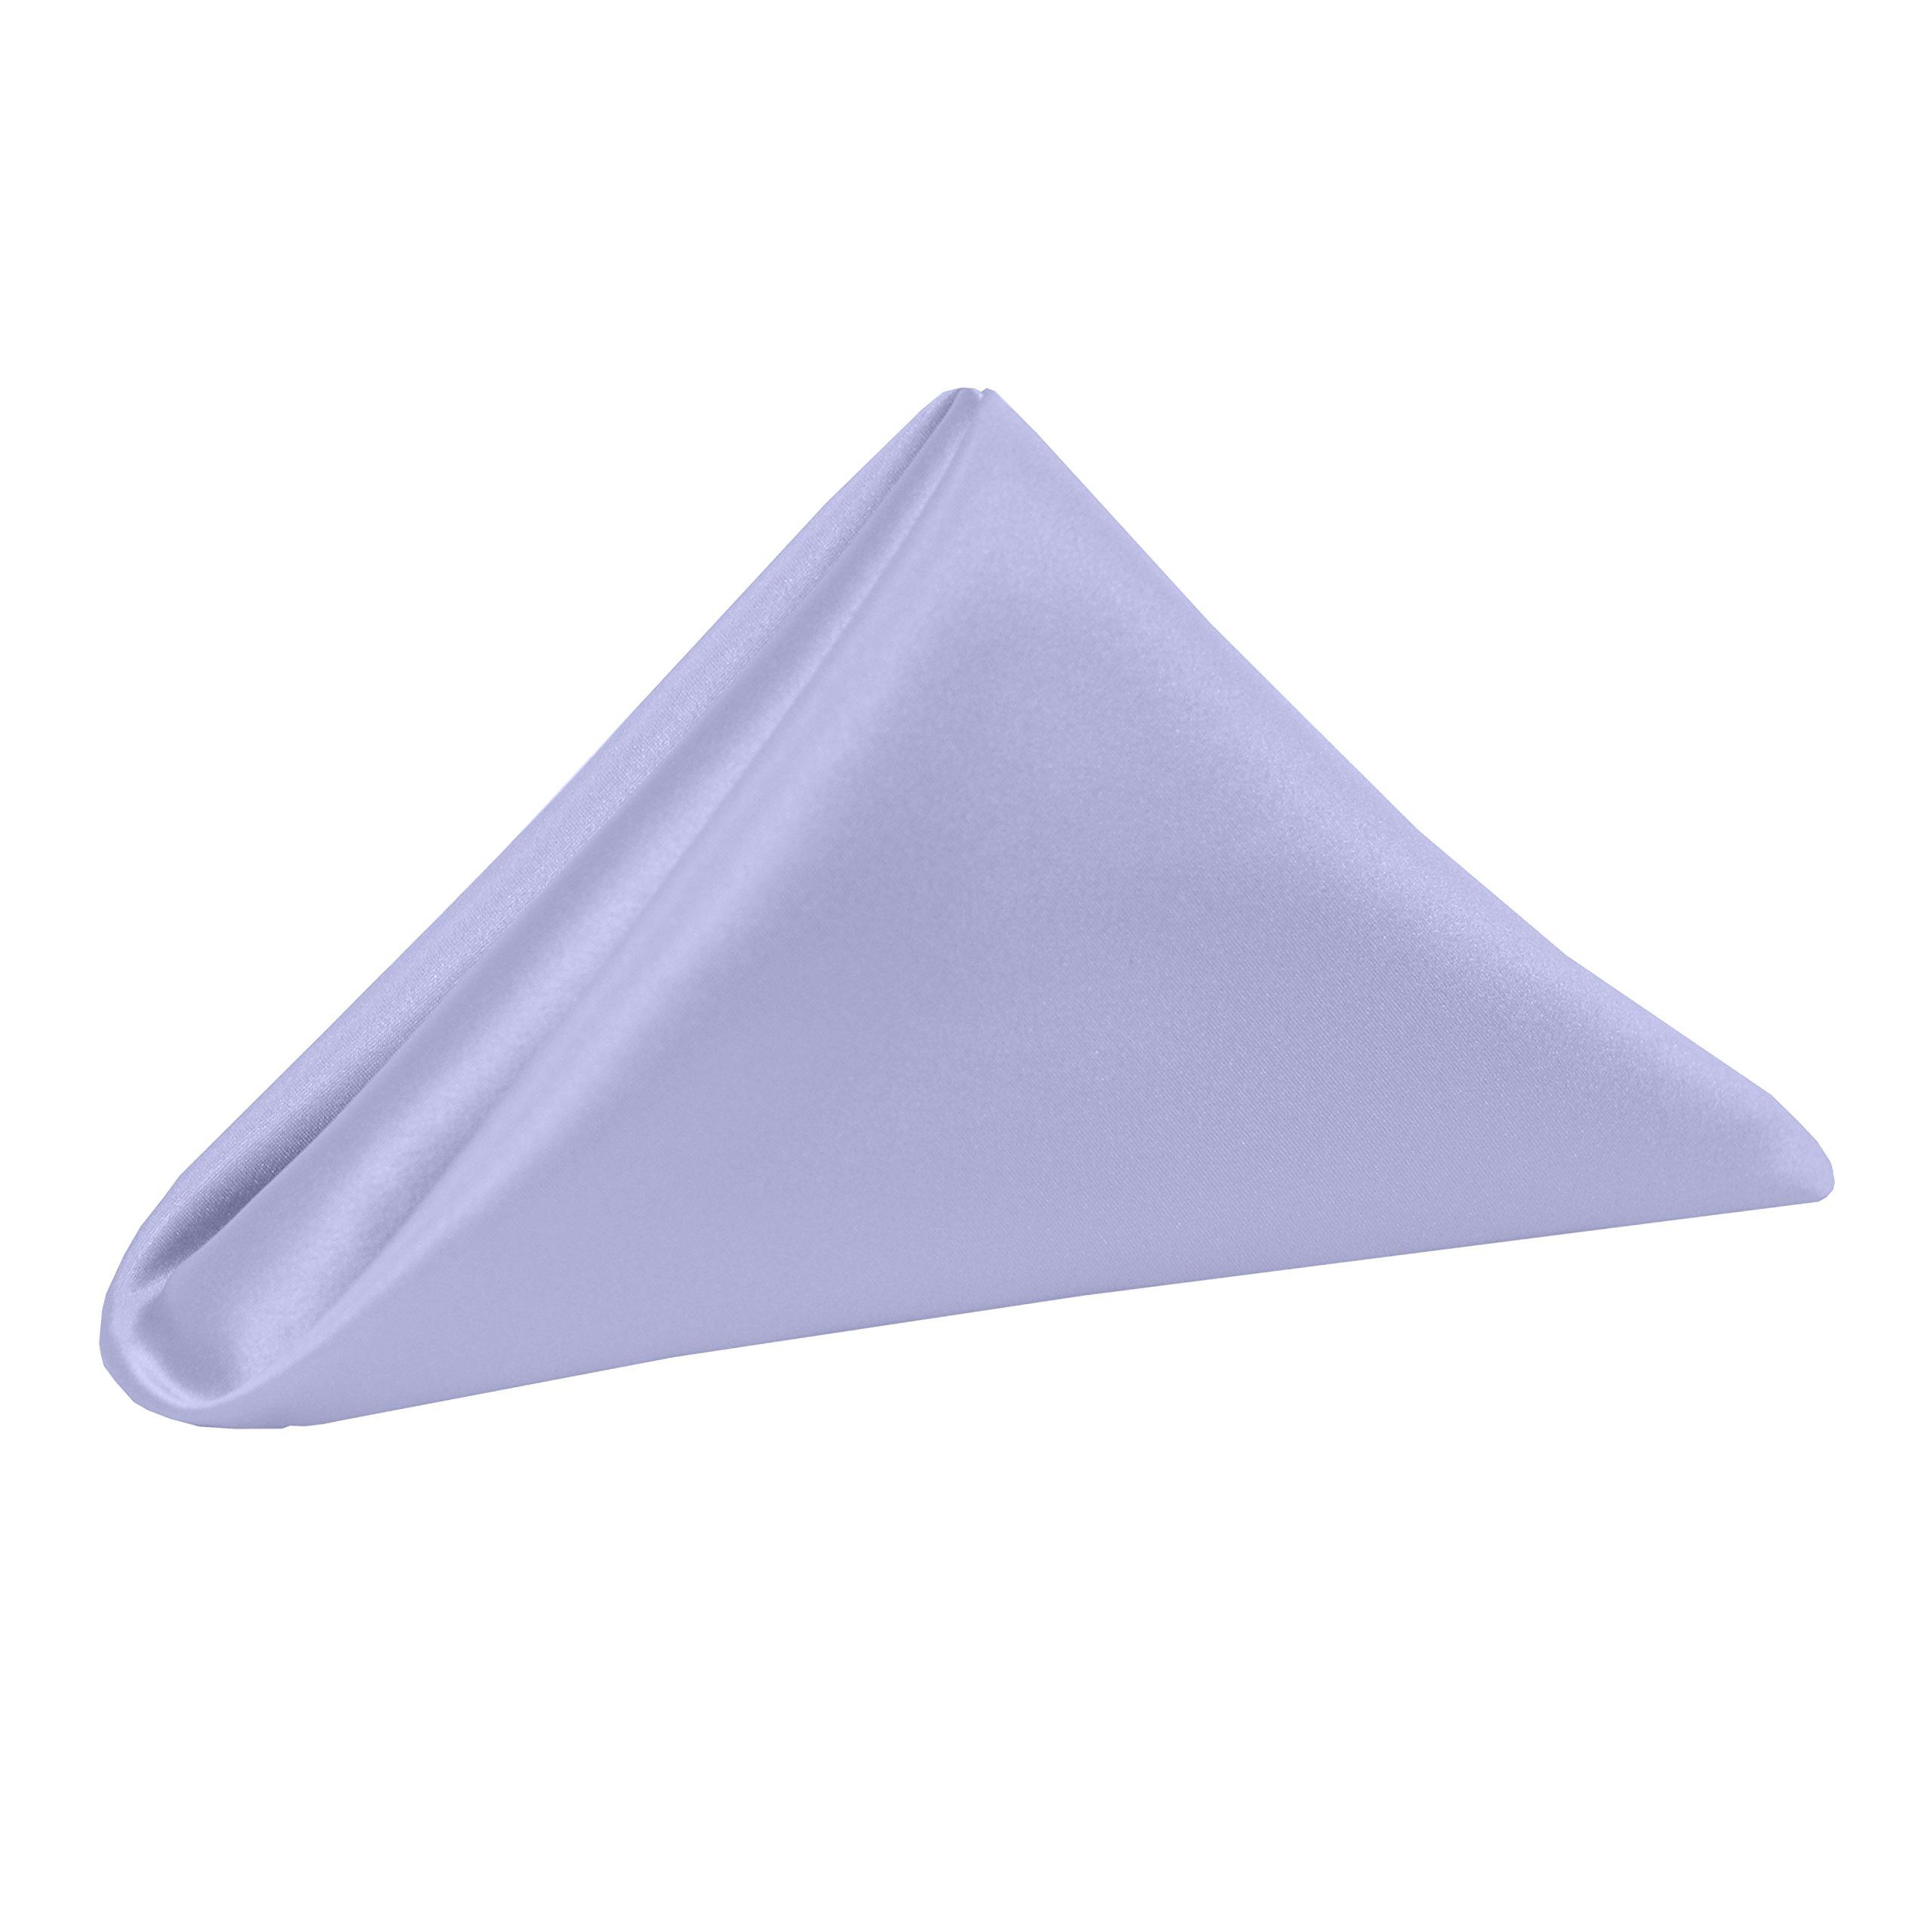 Ultimate Textile -5 Dozen- Bridal Satin 20 x 20-Inch Dinner Napkins, Lilac Light Purple